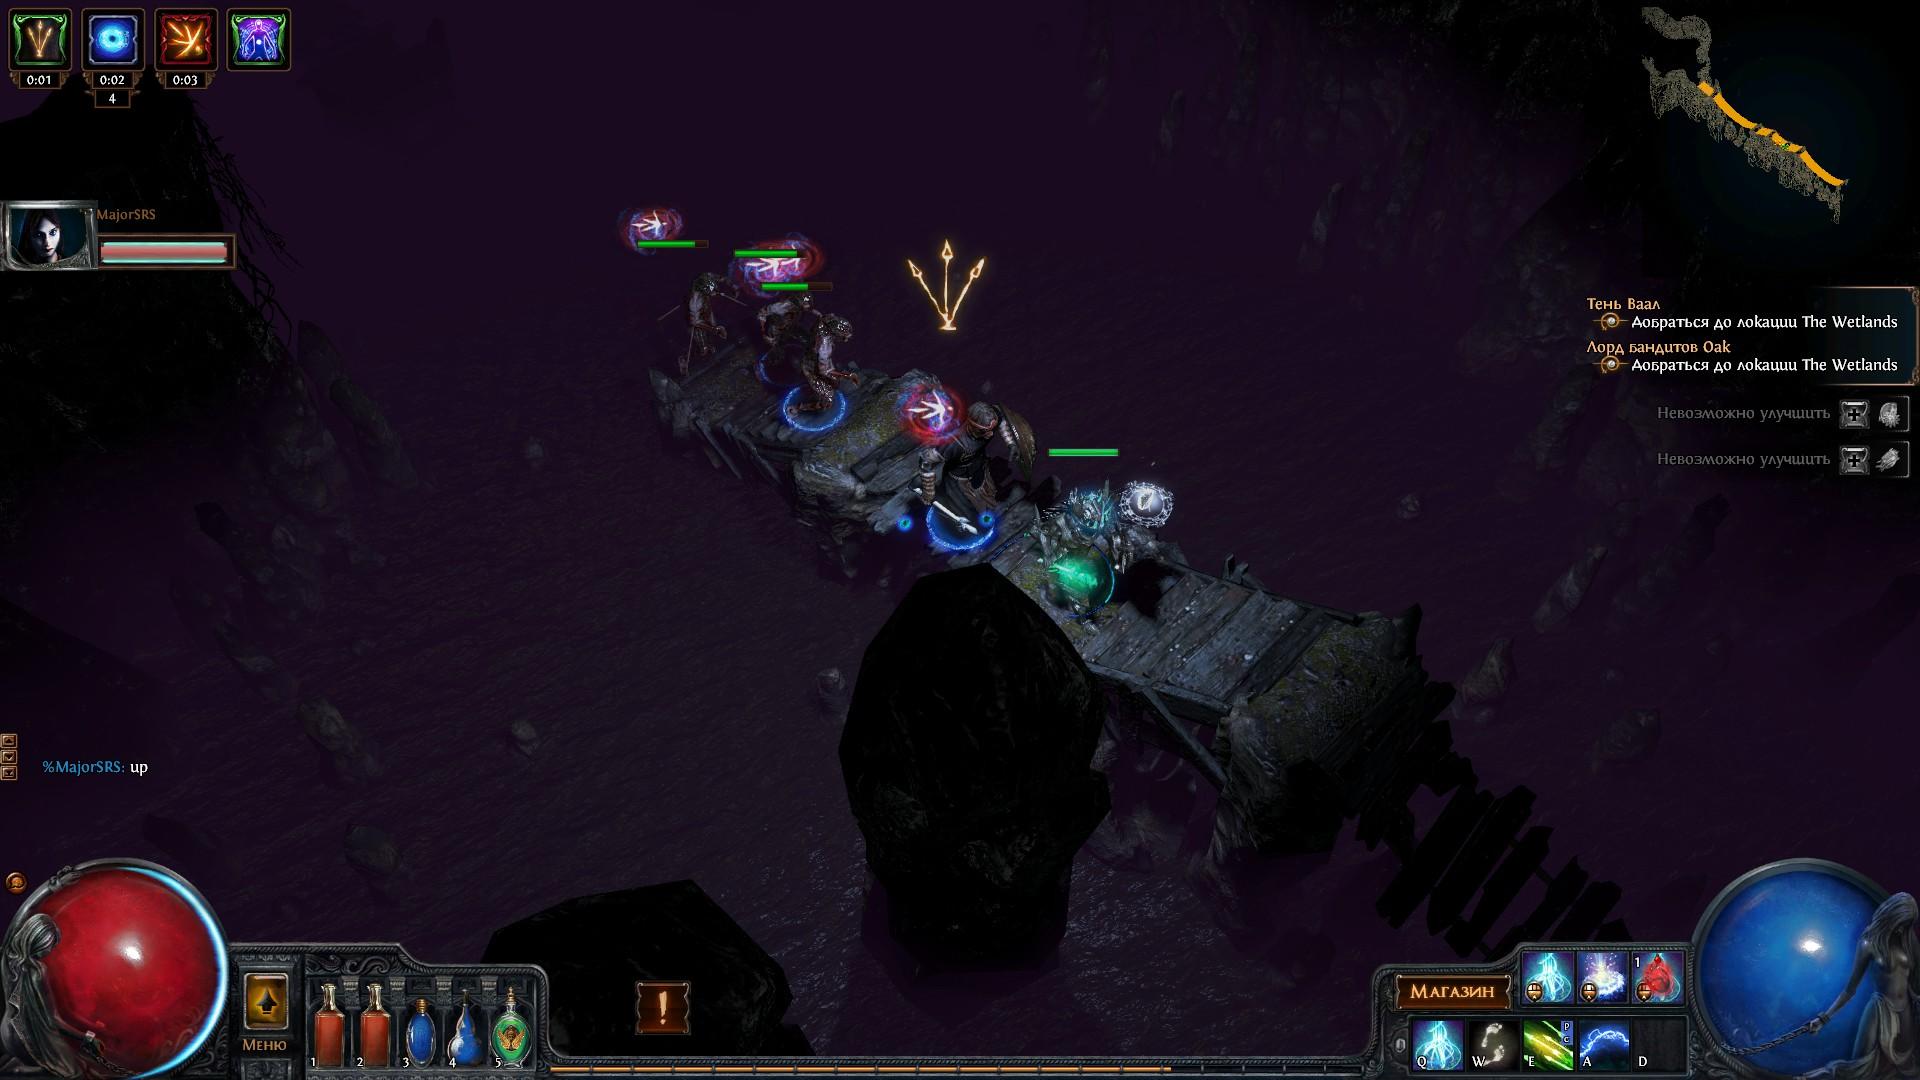 Скриншоты обыкновенные (Steam) - Path of Exile